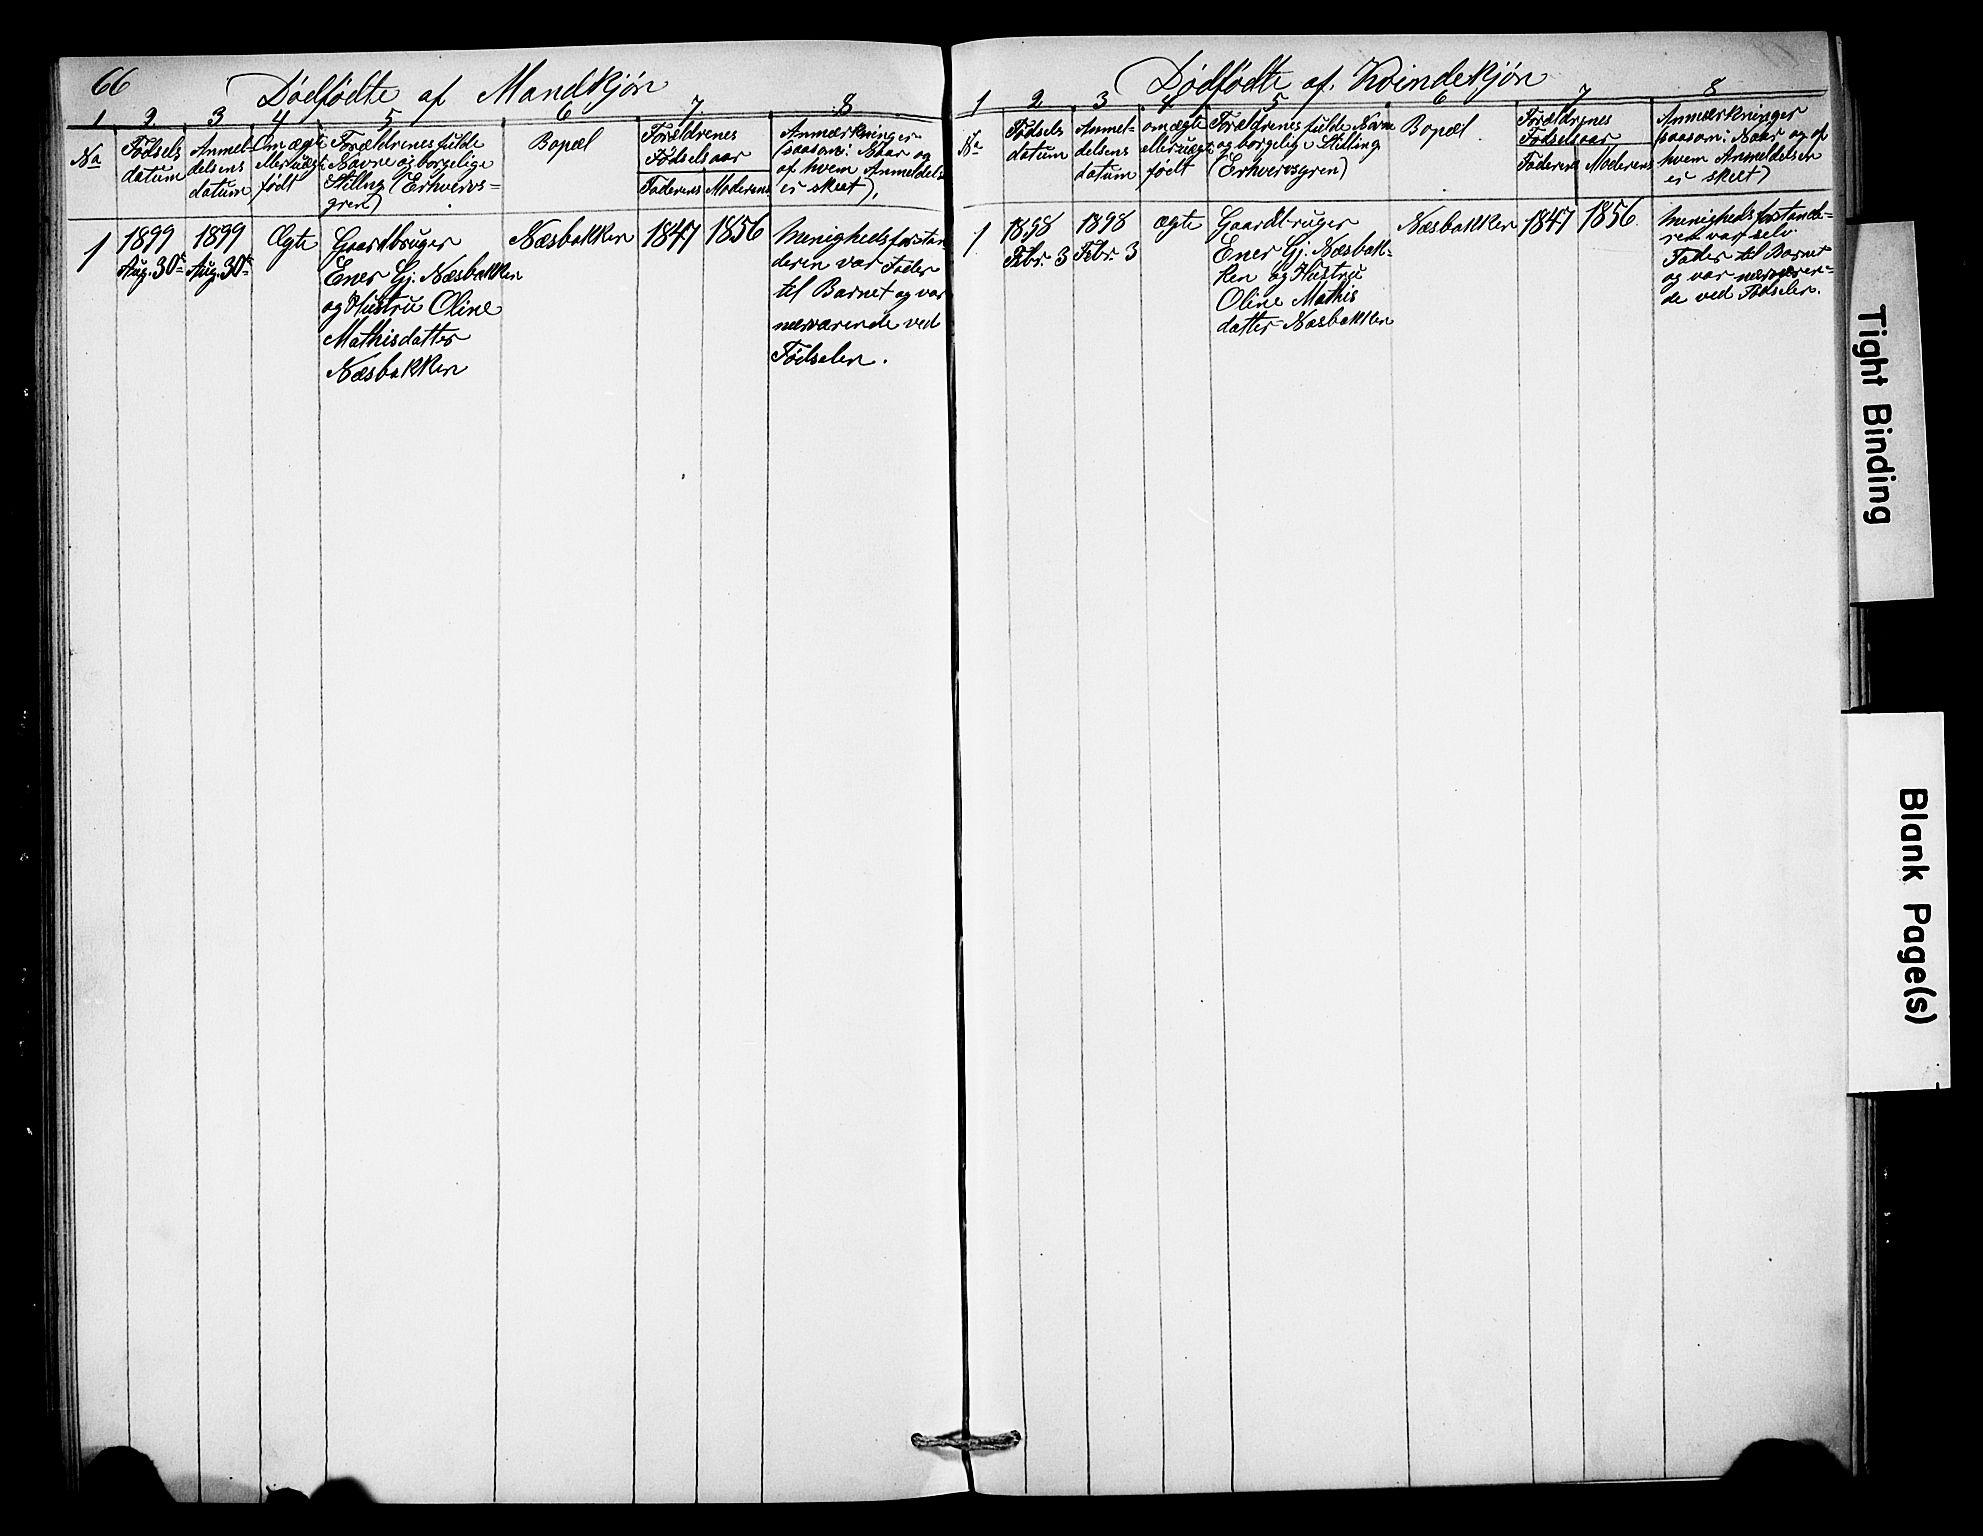 SAH, Misjonsforbundet, 01/L0003: Dissenterprotokoll nr. 3, 1892-1920, s. 66